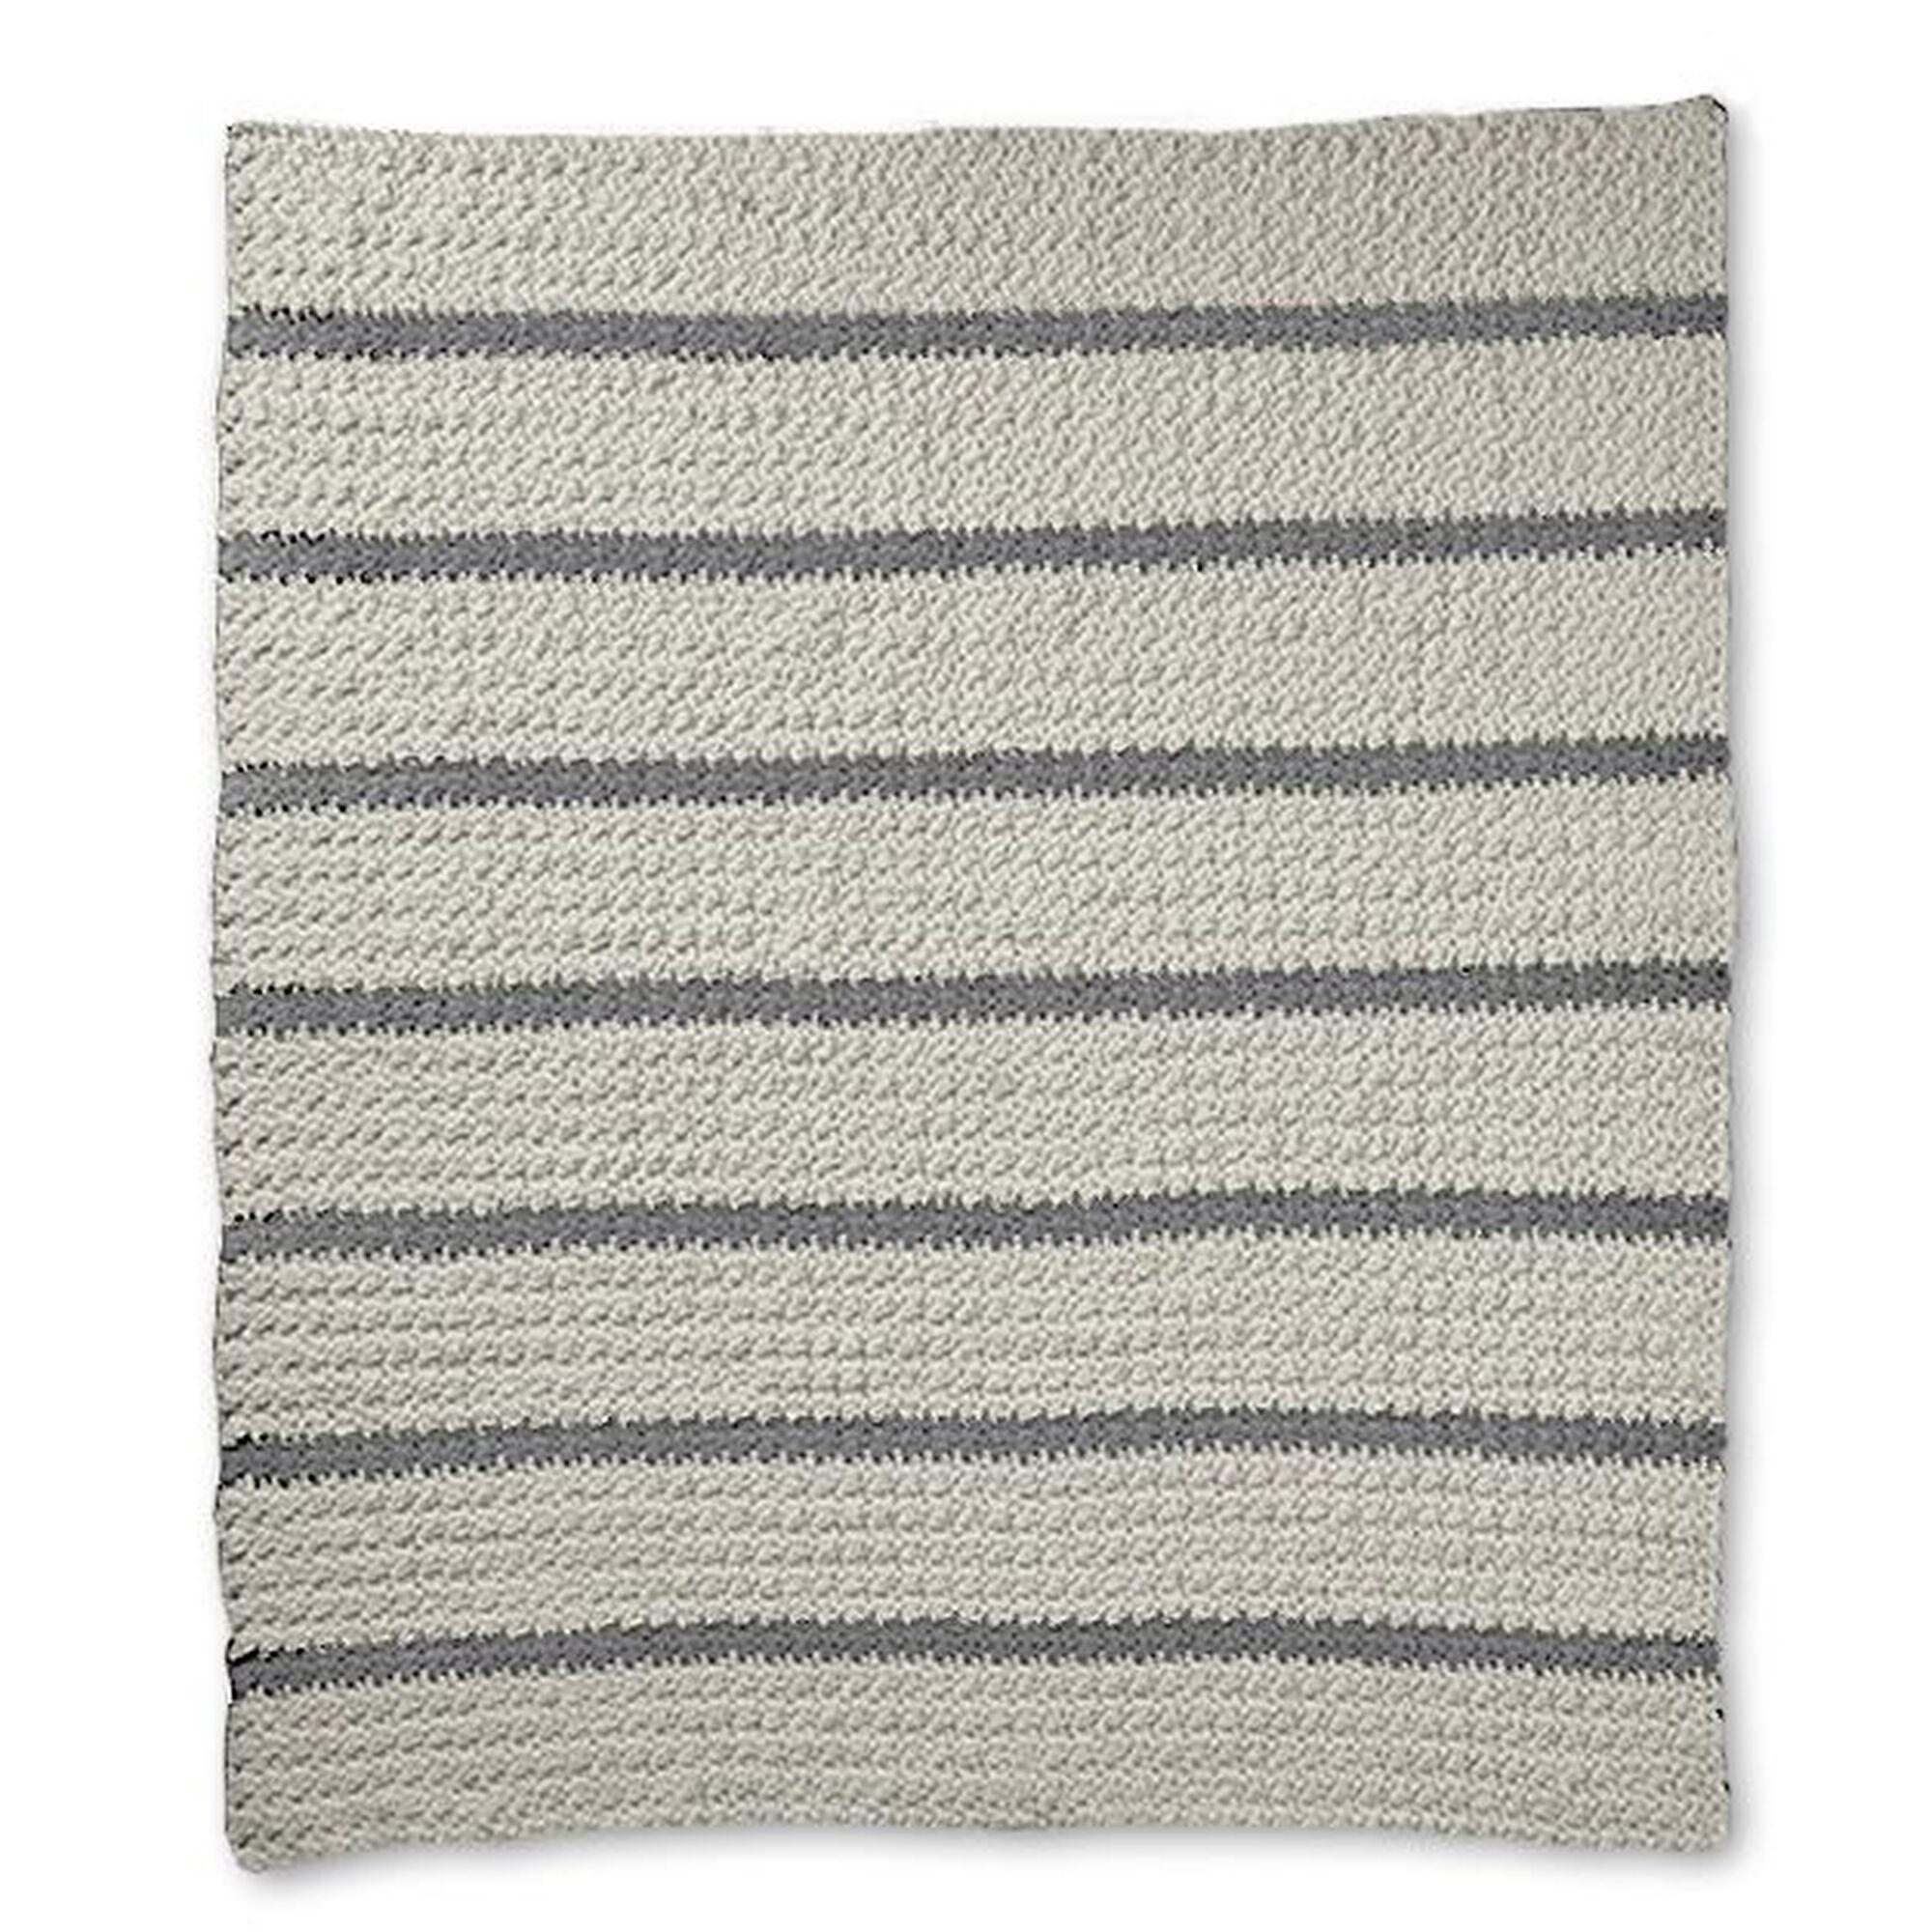 Bernat Pin Stripe Crochet Blanket Yarnspirations